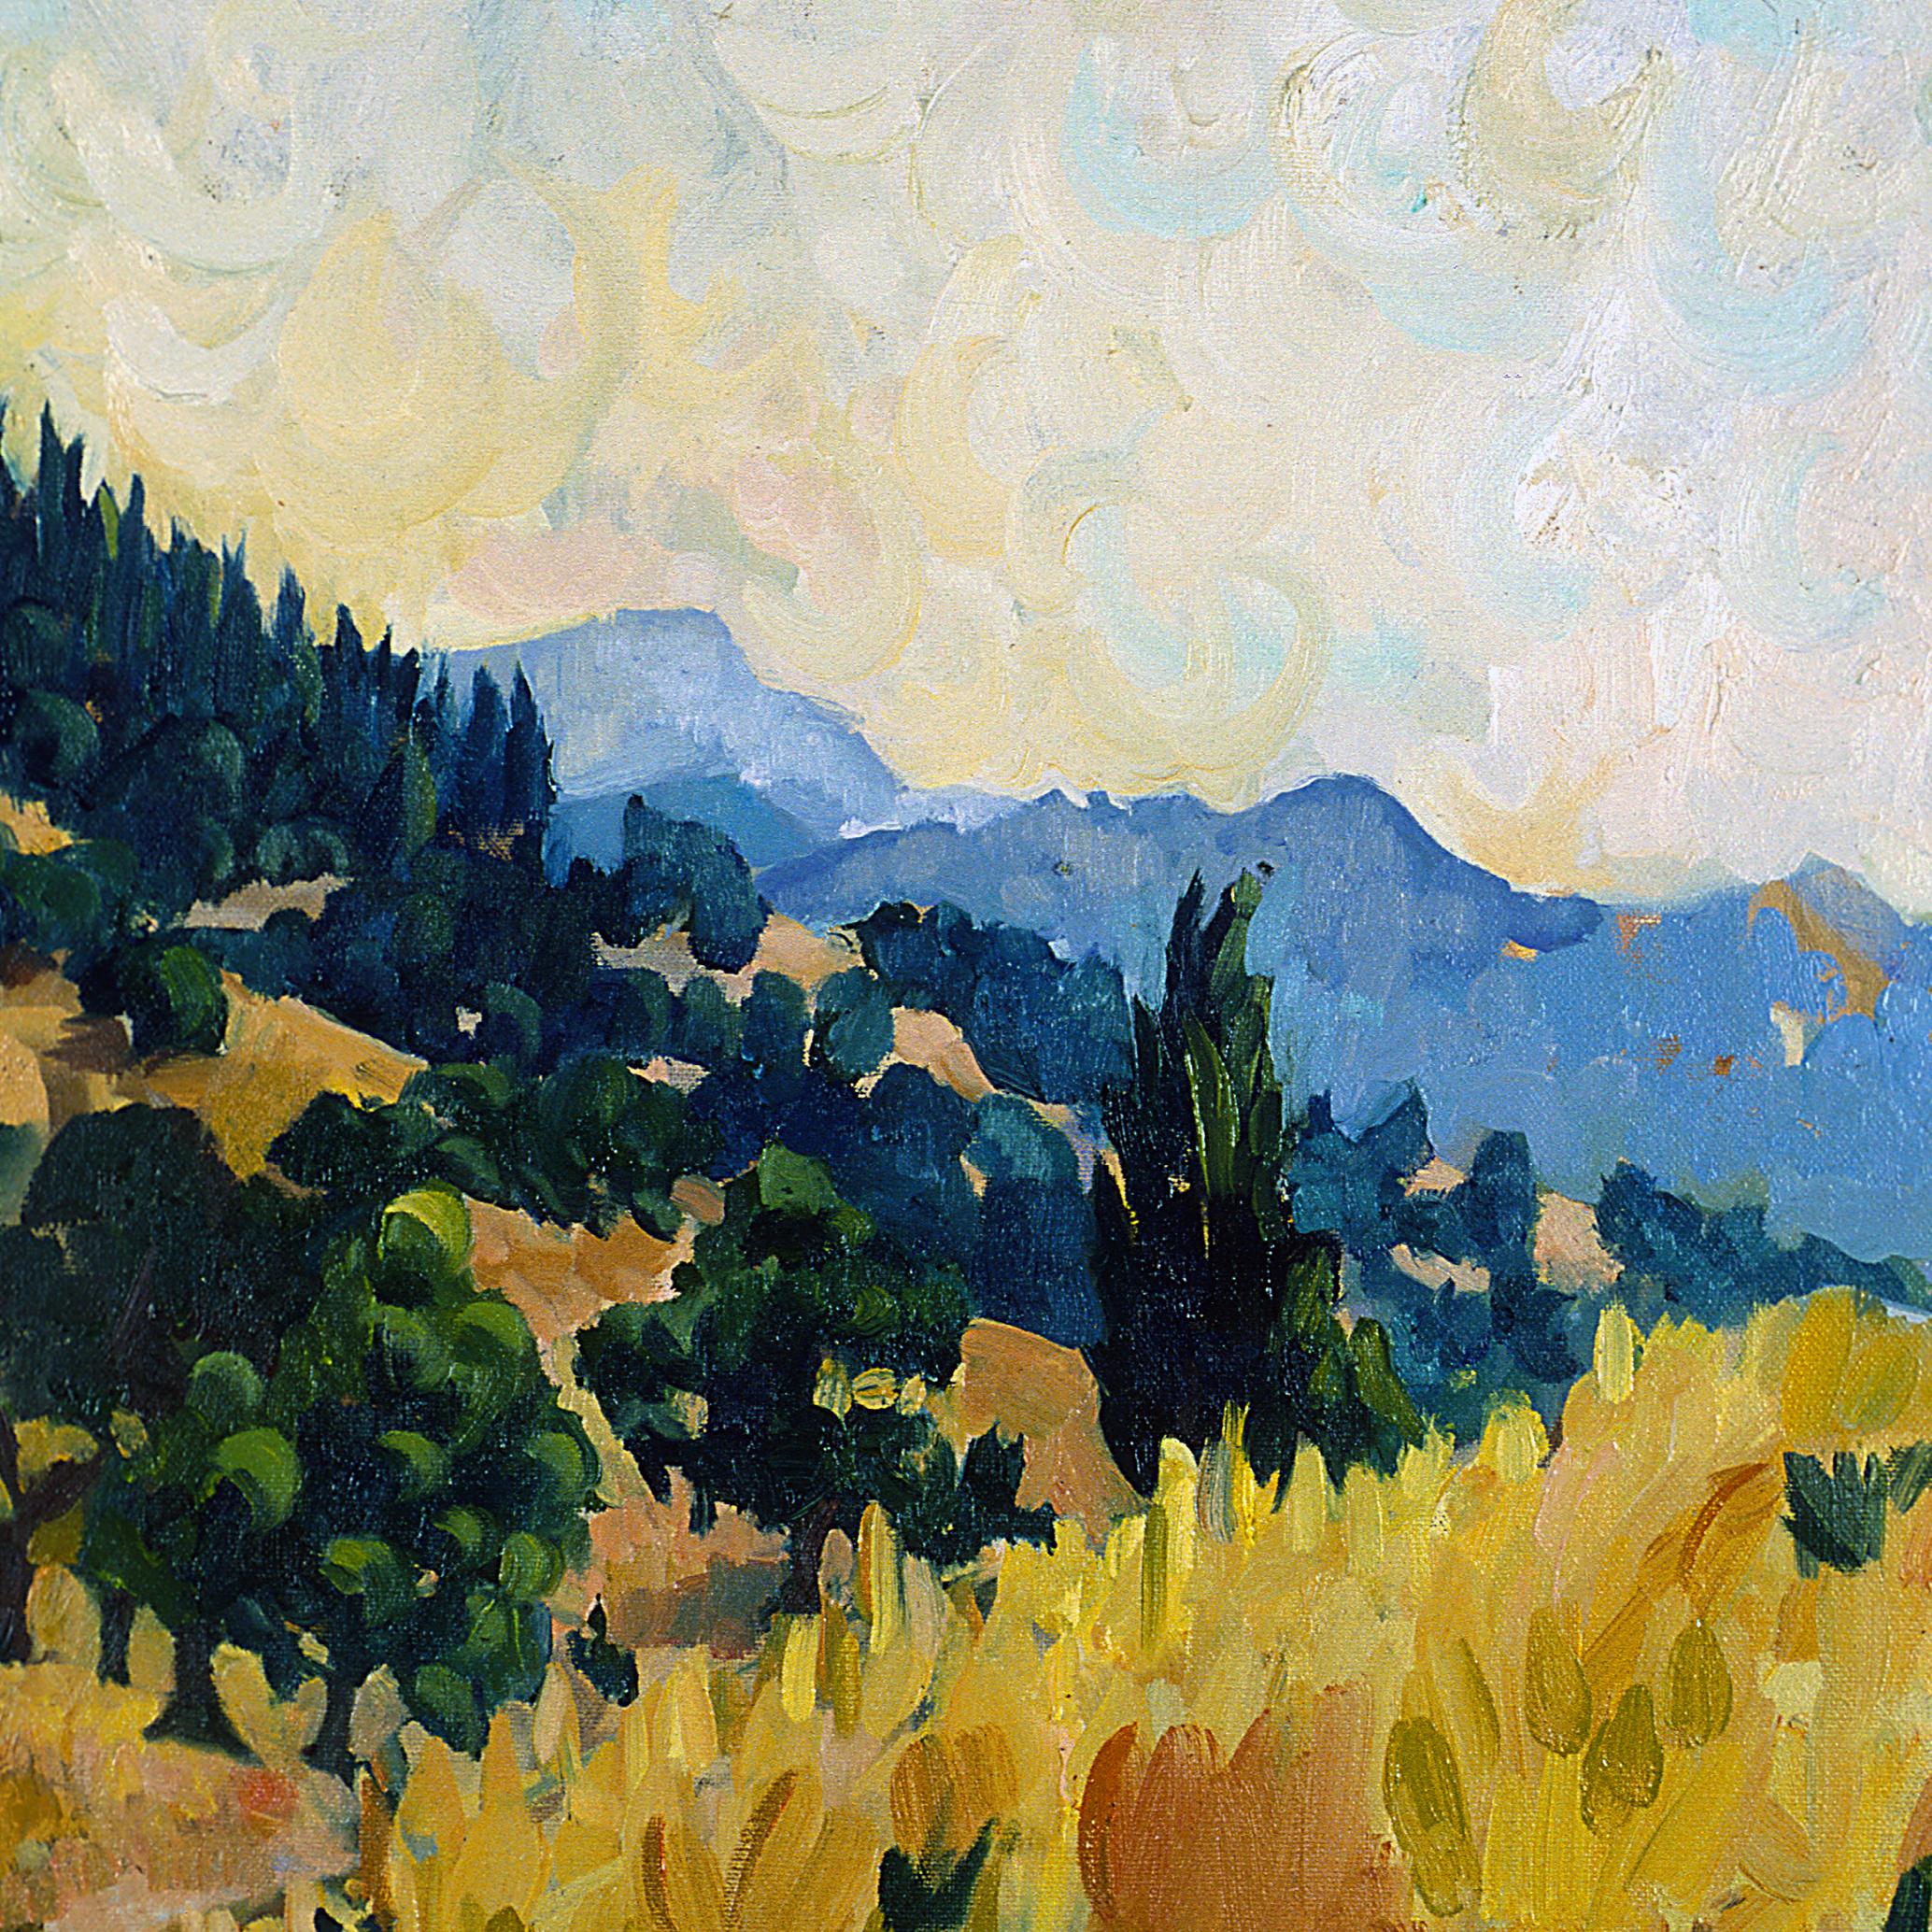 Tea in Sonoma  30 x 30 inches Oil on Canvas 1998